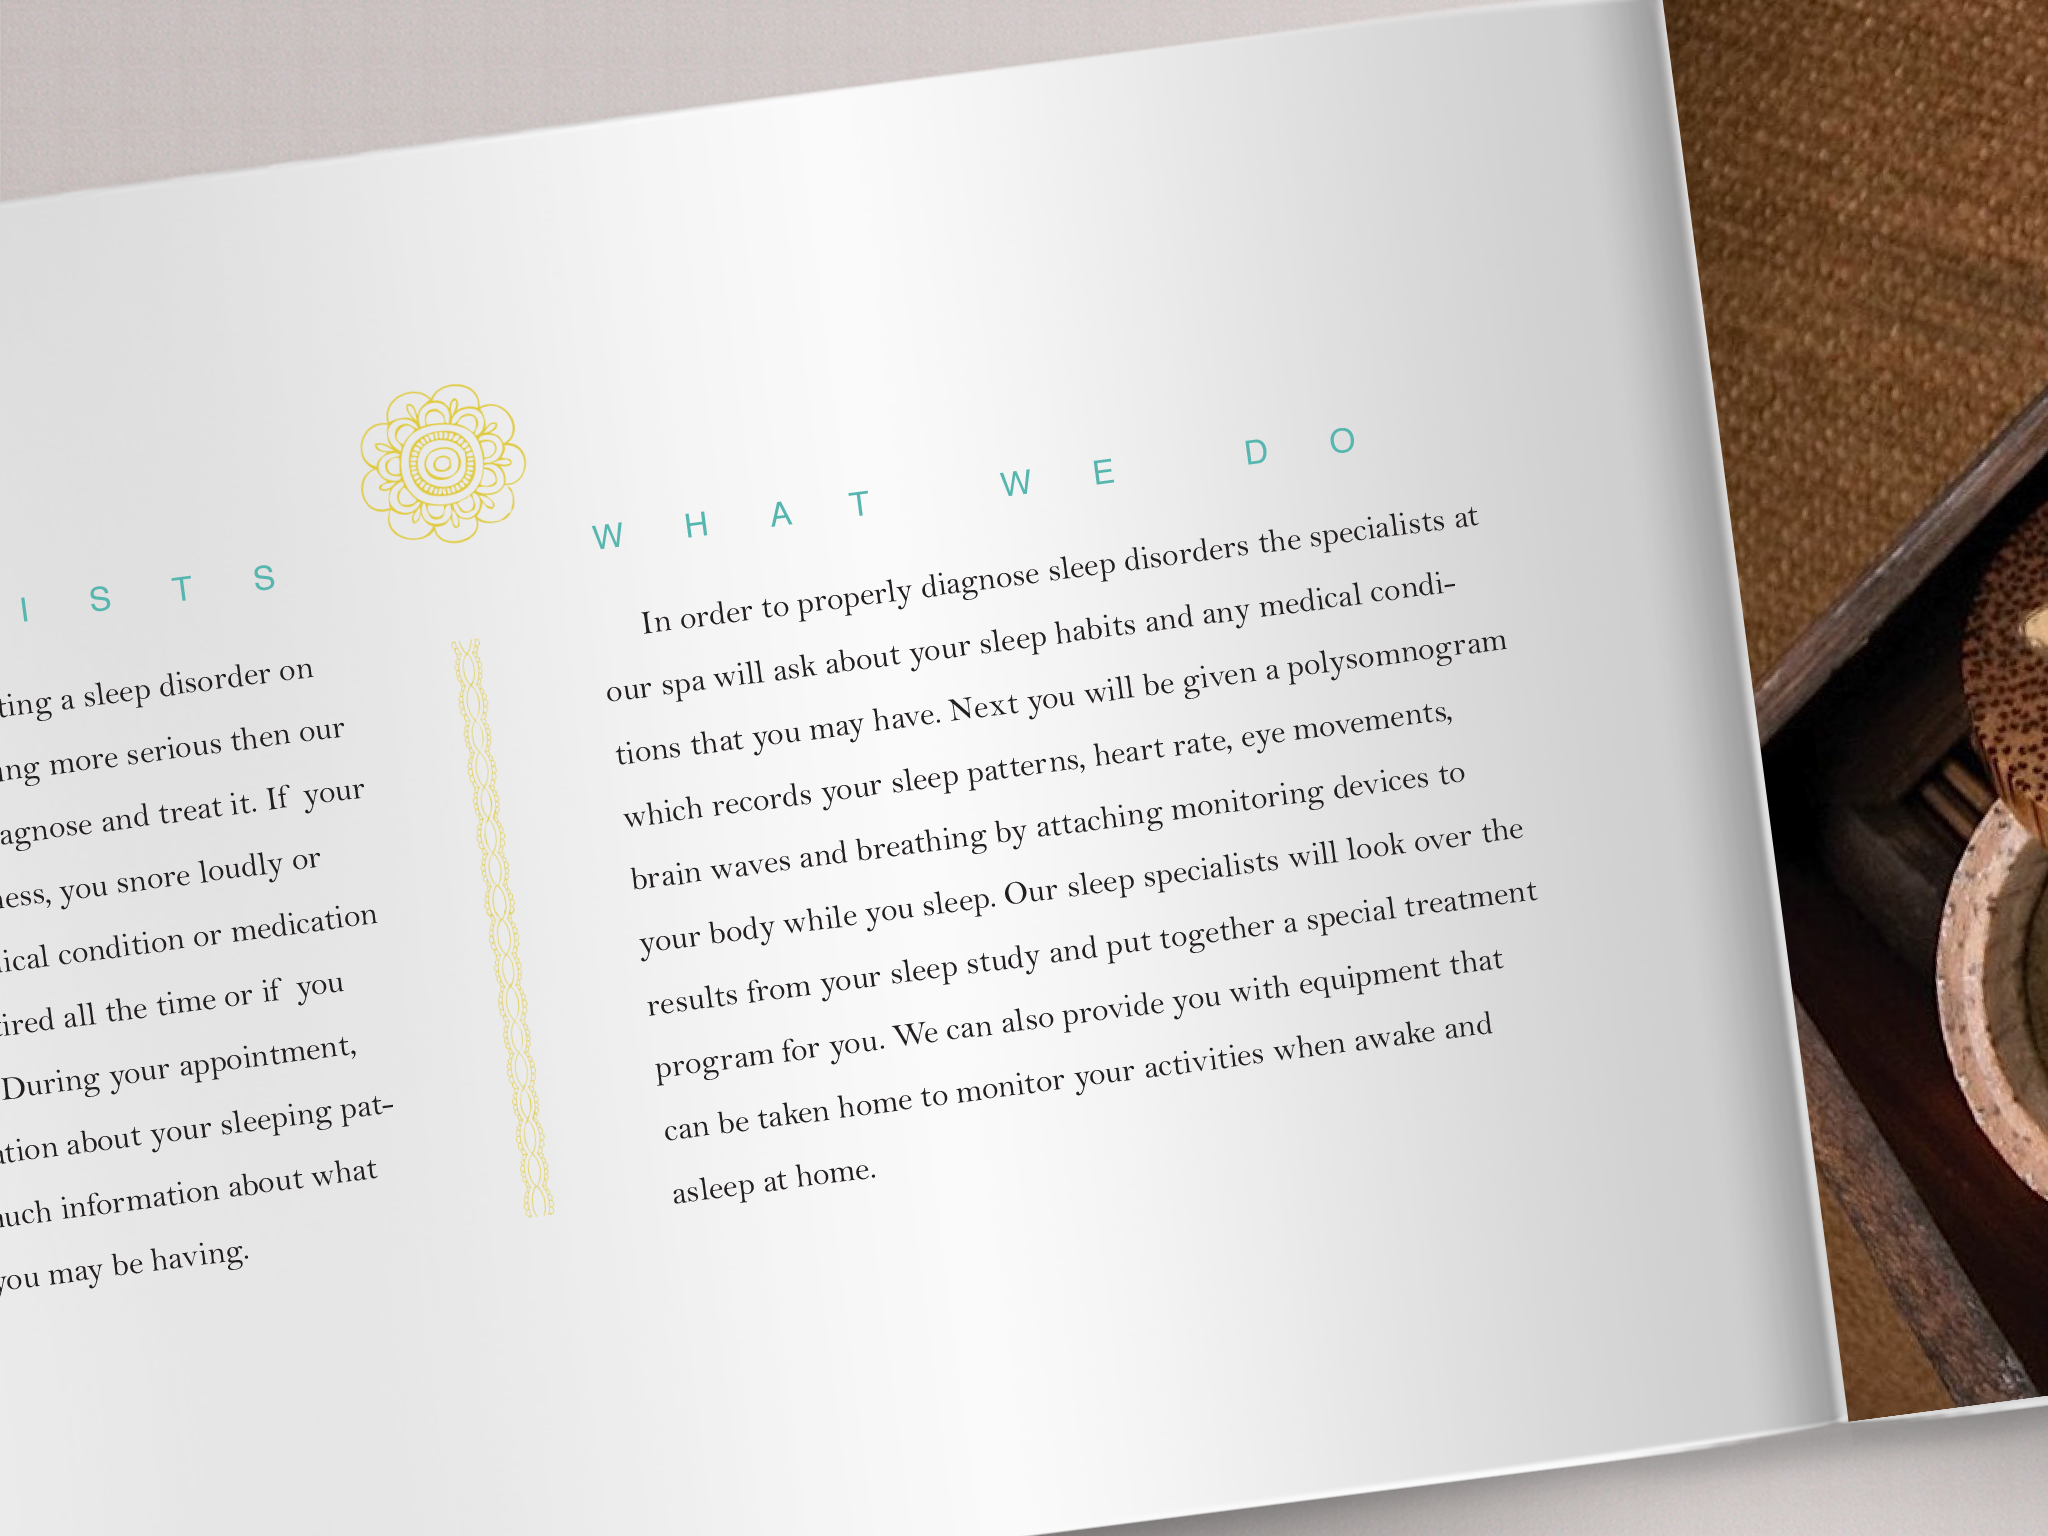 shanti book page 11.jpg